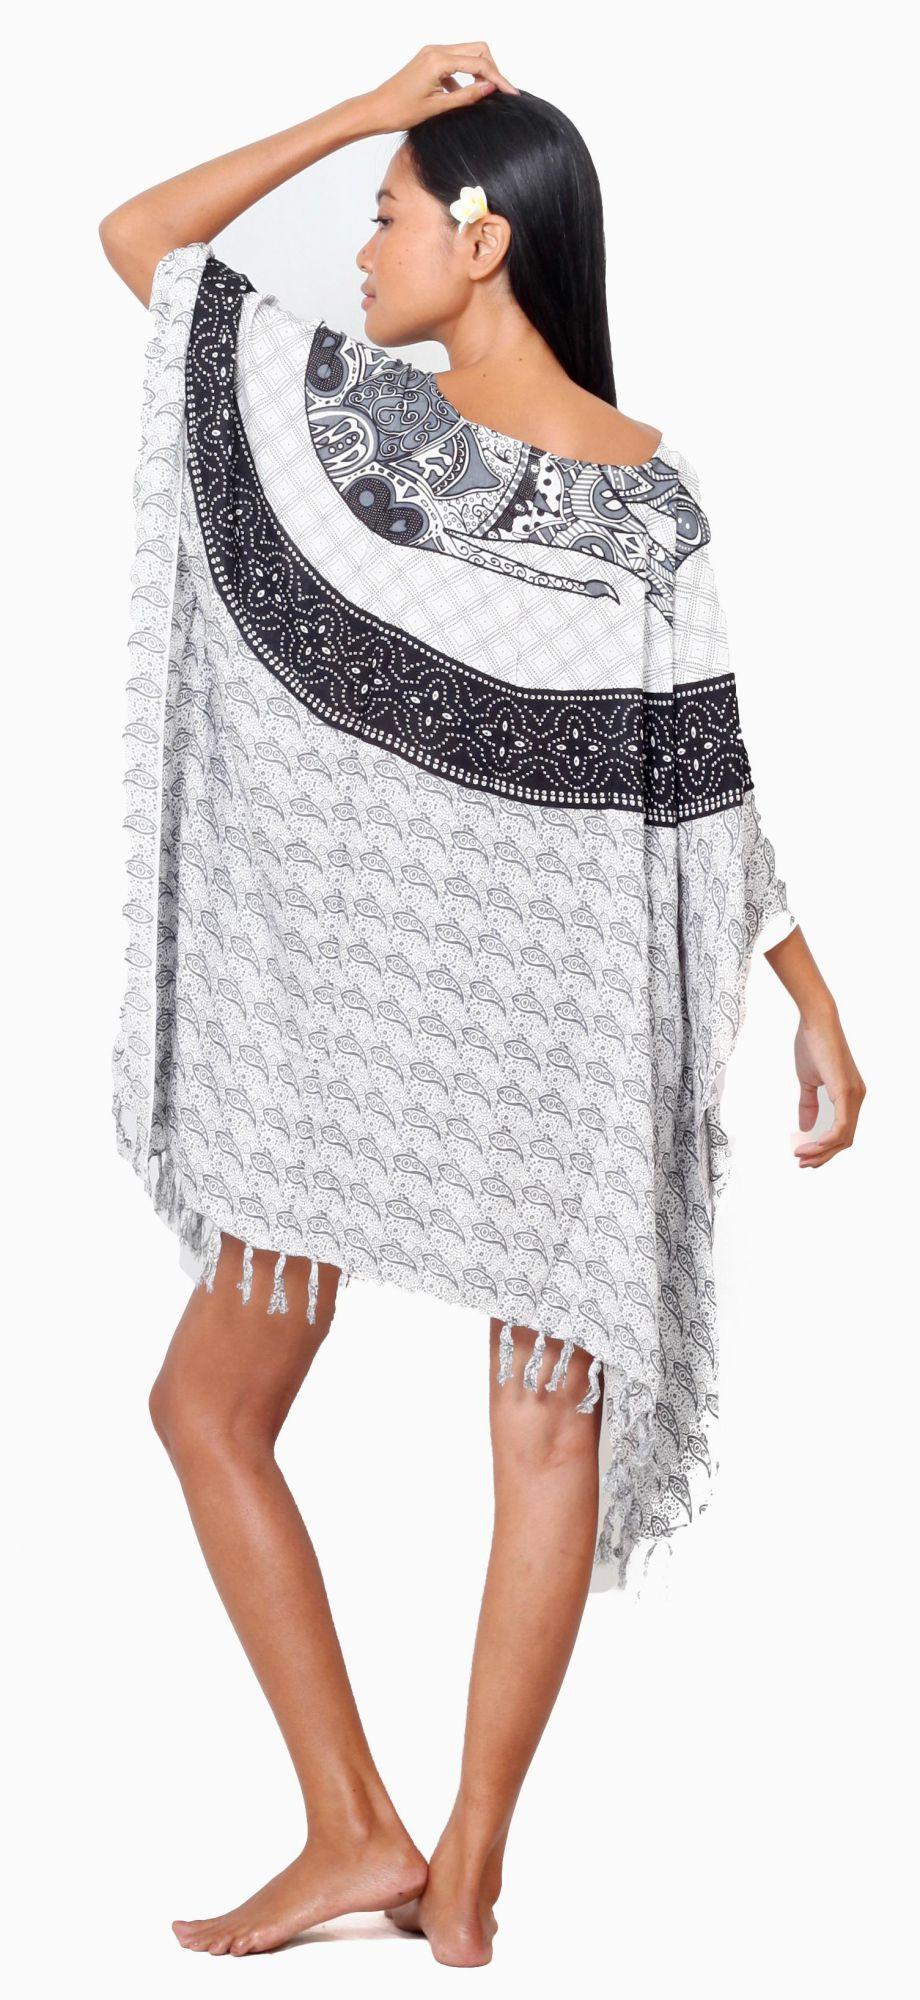 Robe Paréo patchwork élephant noir